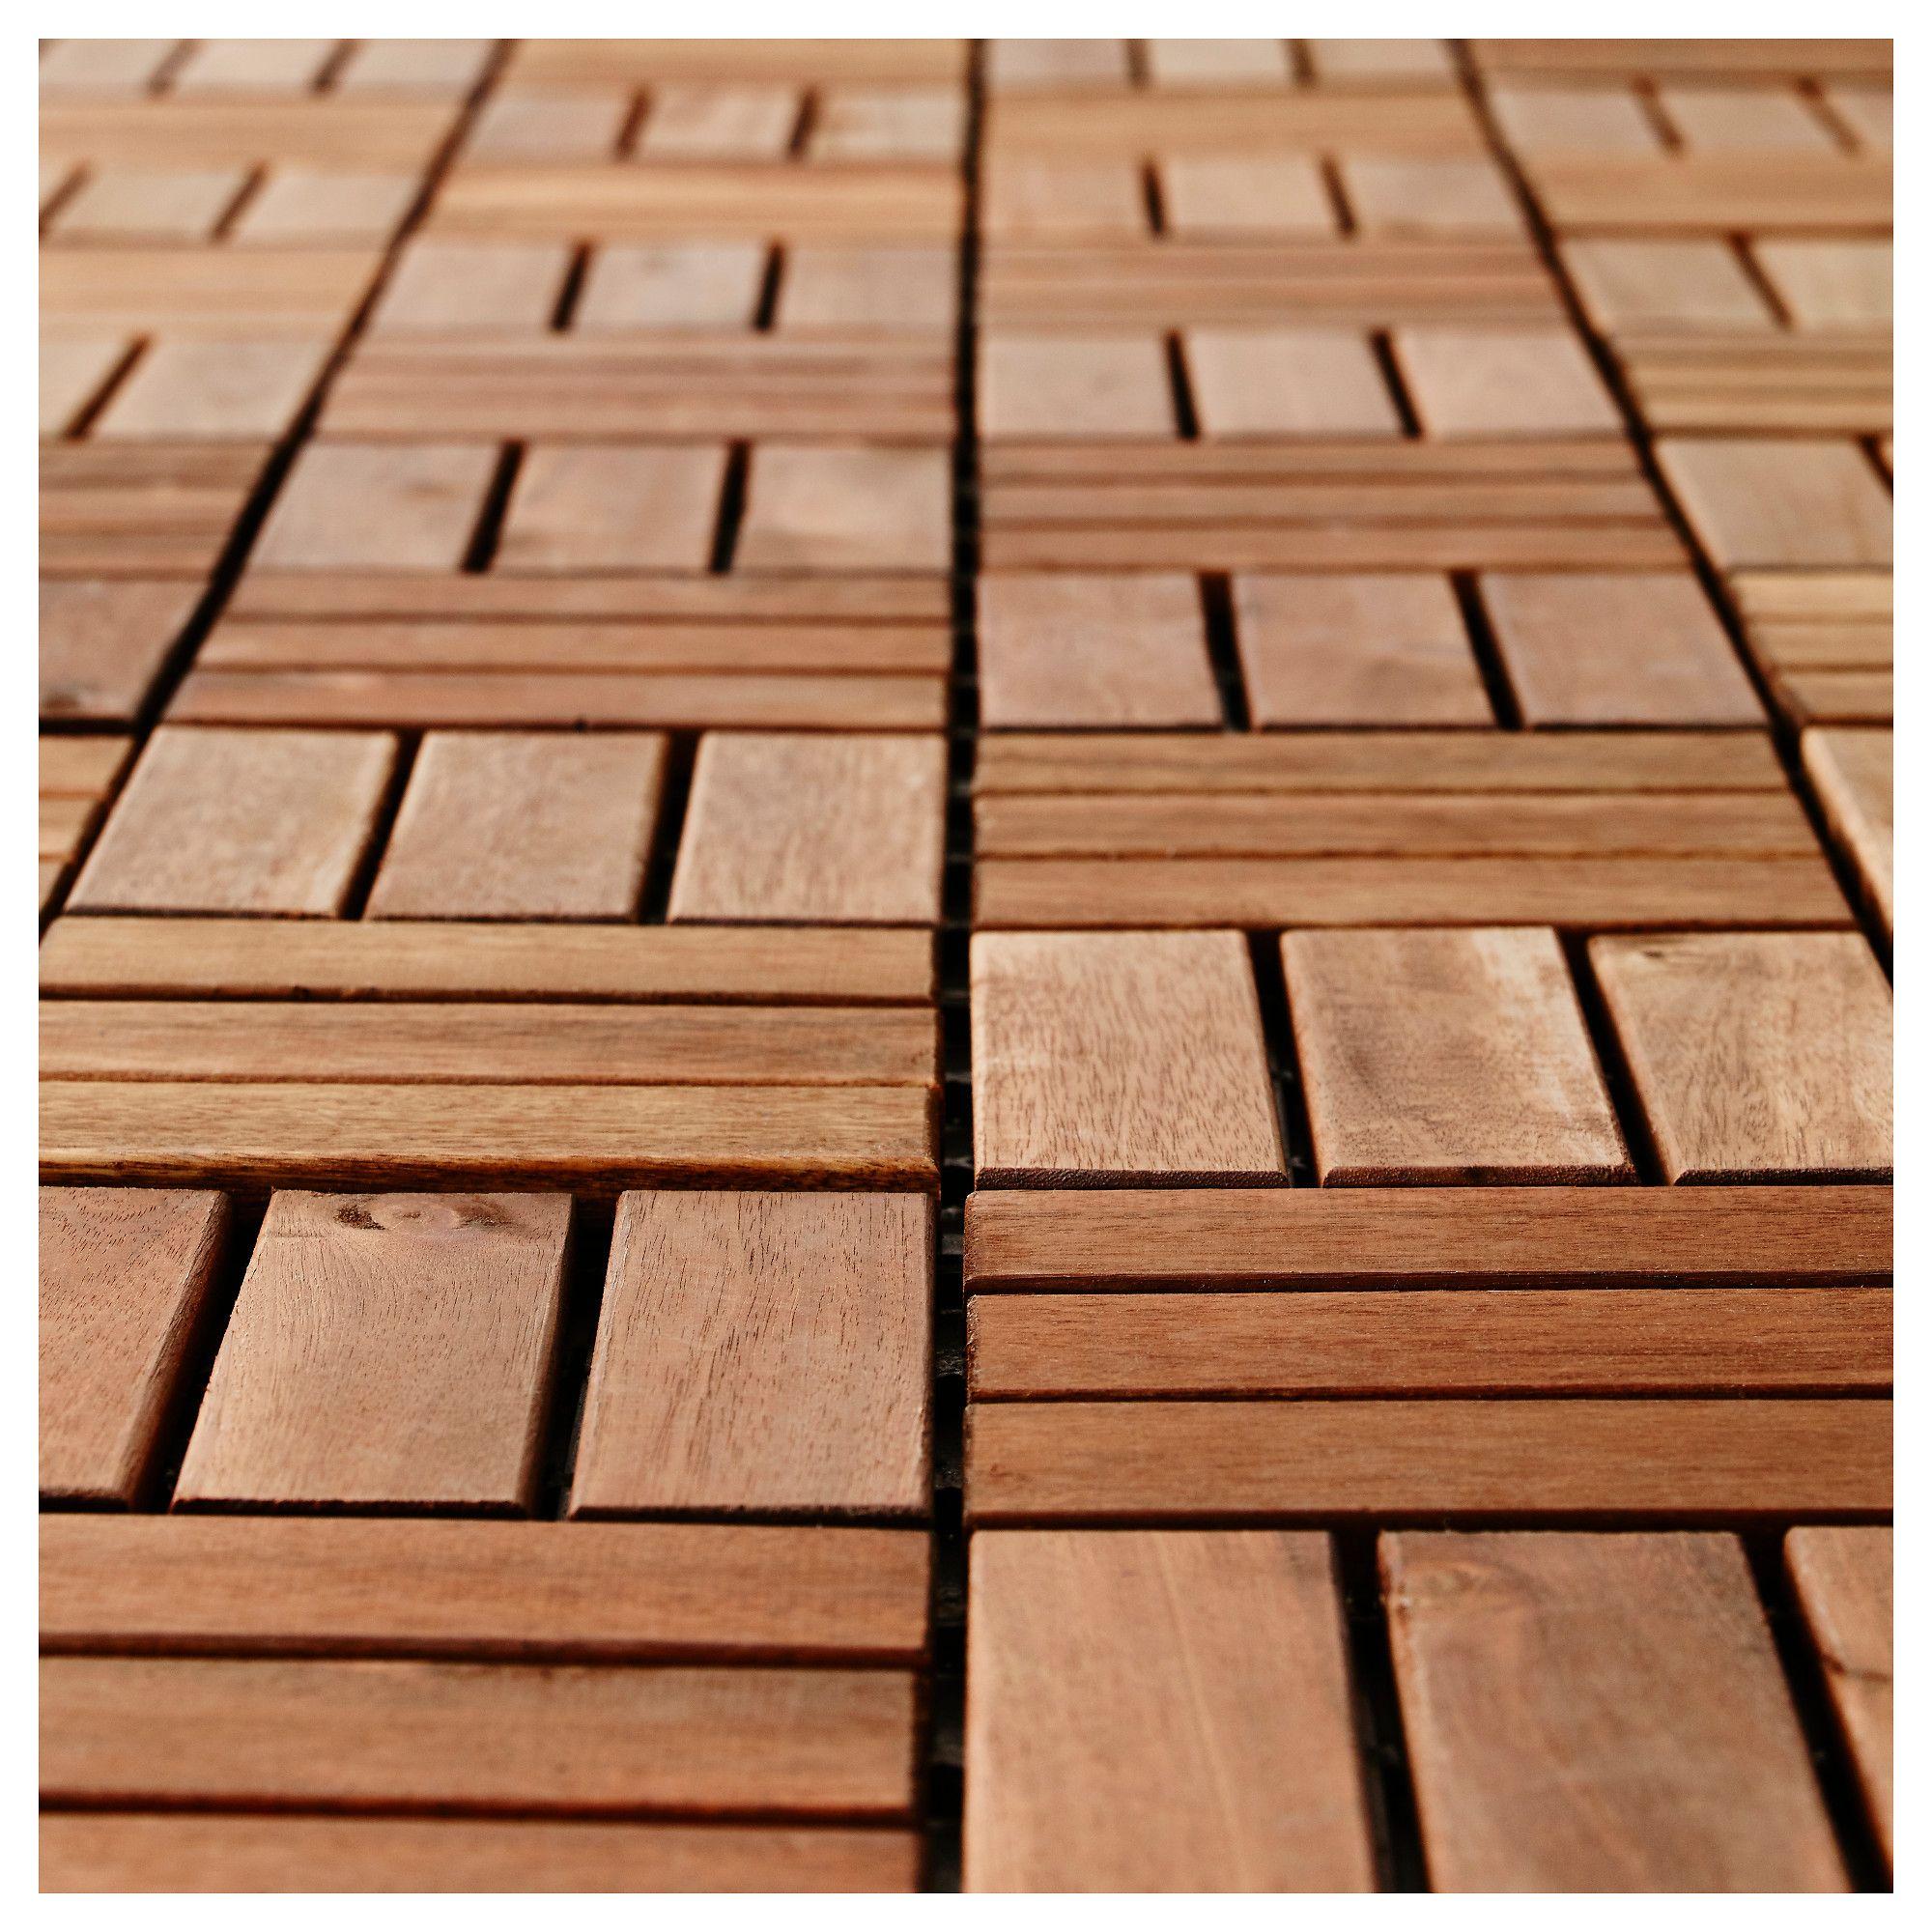 IKEA RUNNEN Decking, outdoor brown stained Outdoor